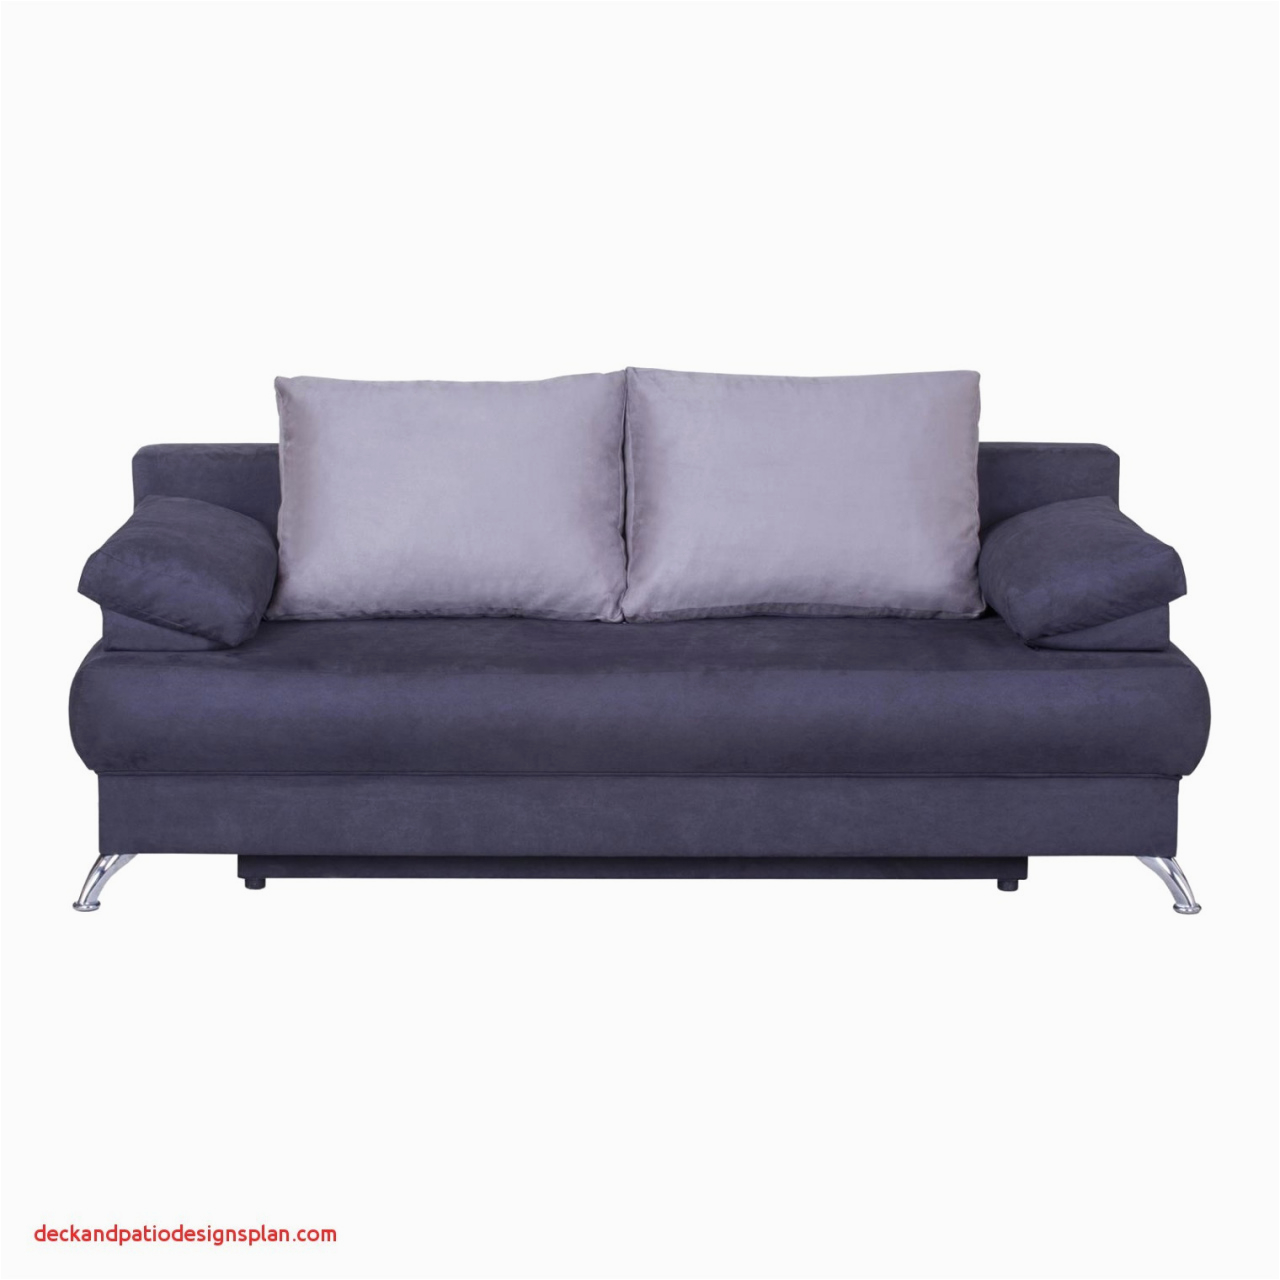 purple sofa bed 2er sofa leder zweisitzer schlafsofa frisch sofa zweisitzer 0d durch purple sofa bed